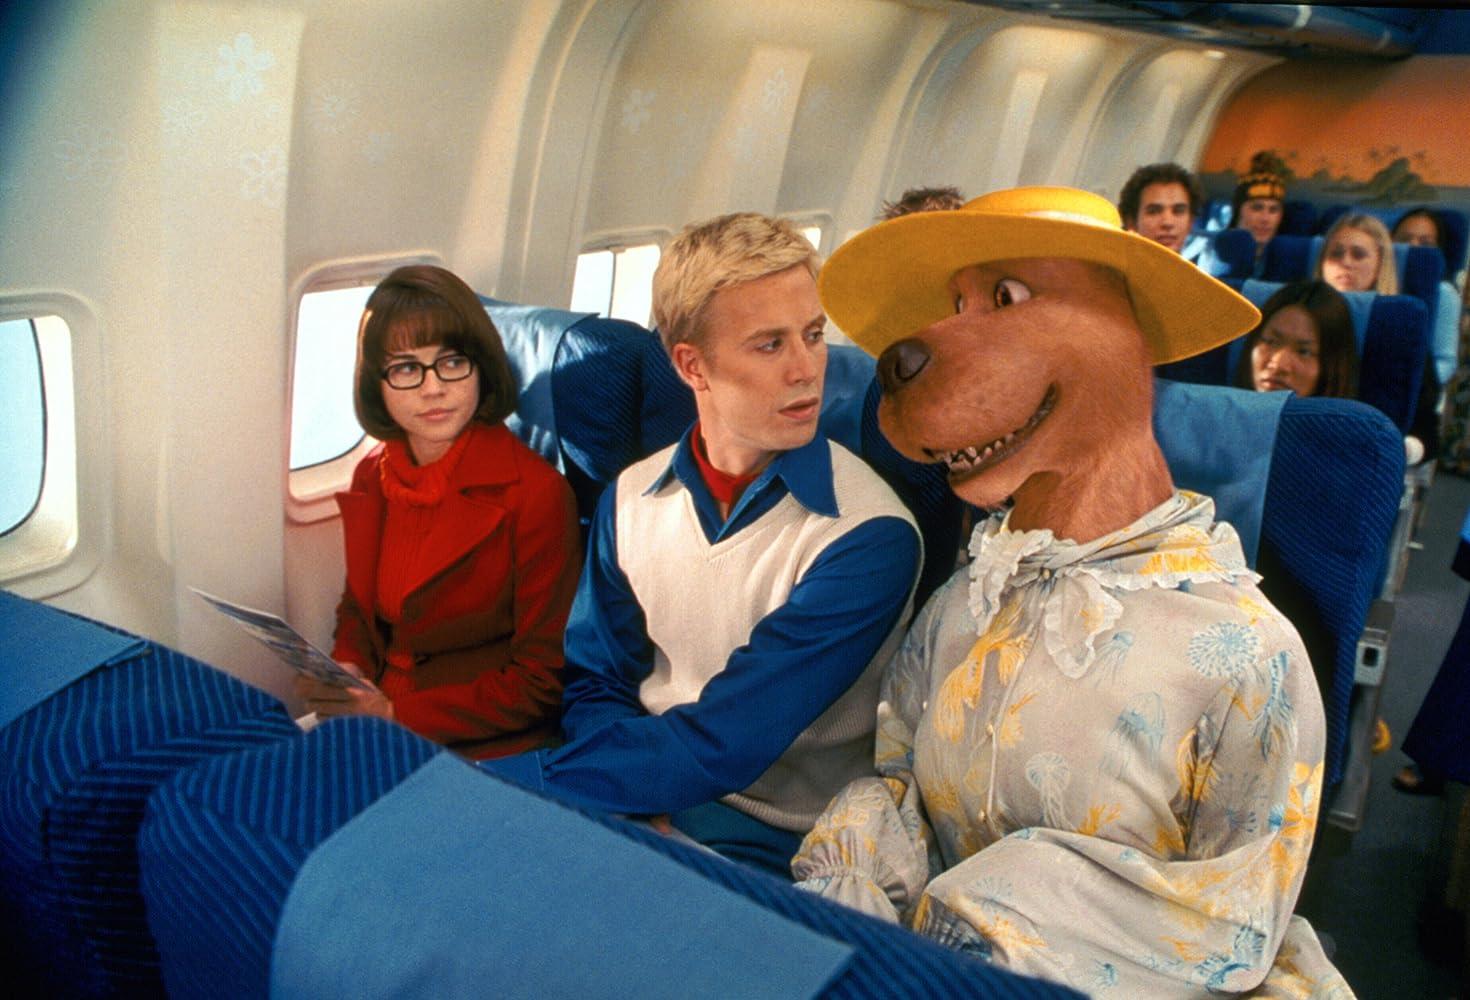 Linda Cardellini, Freddie Prinze Jr., and Neil Fanning in Scooby-Doo (2002)